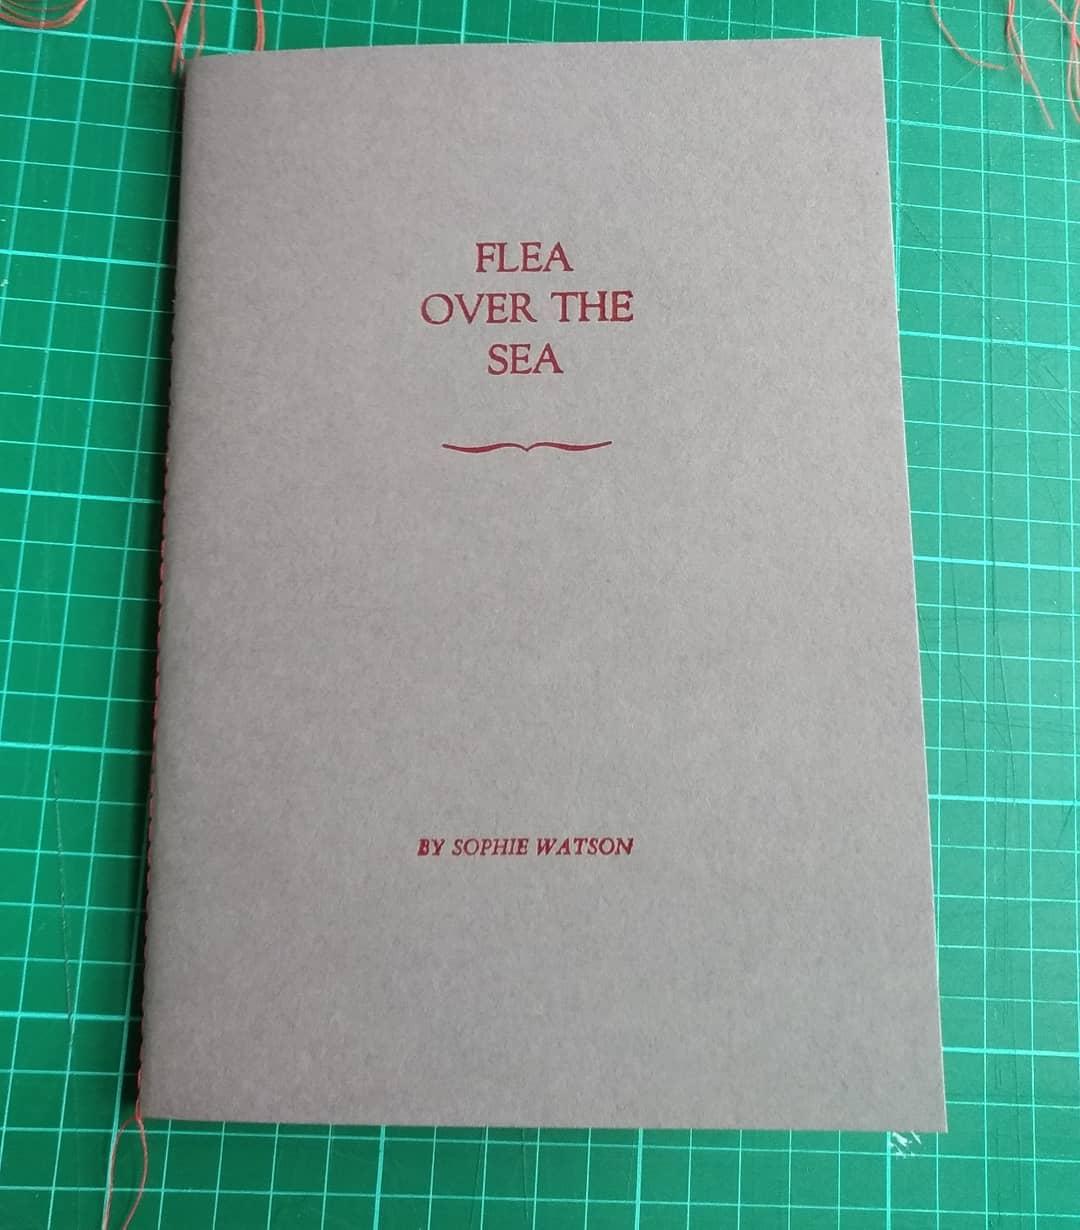 Letterpress printed cover of Flea Over The Sea